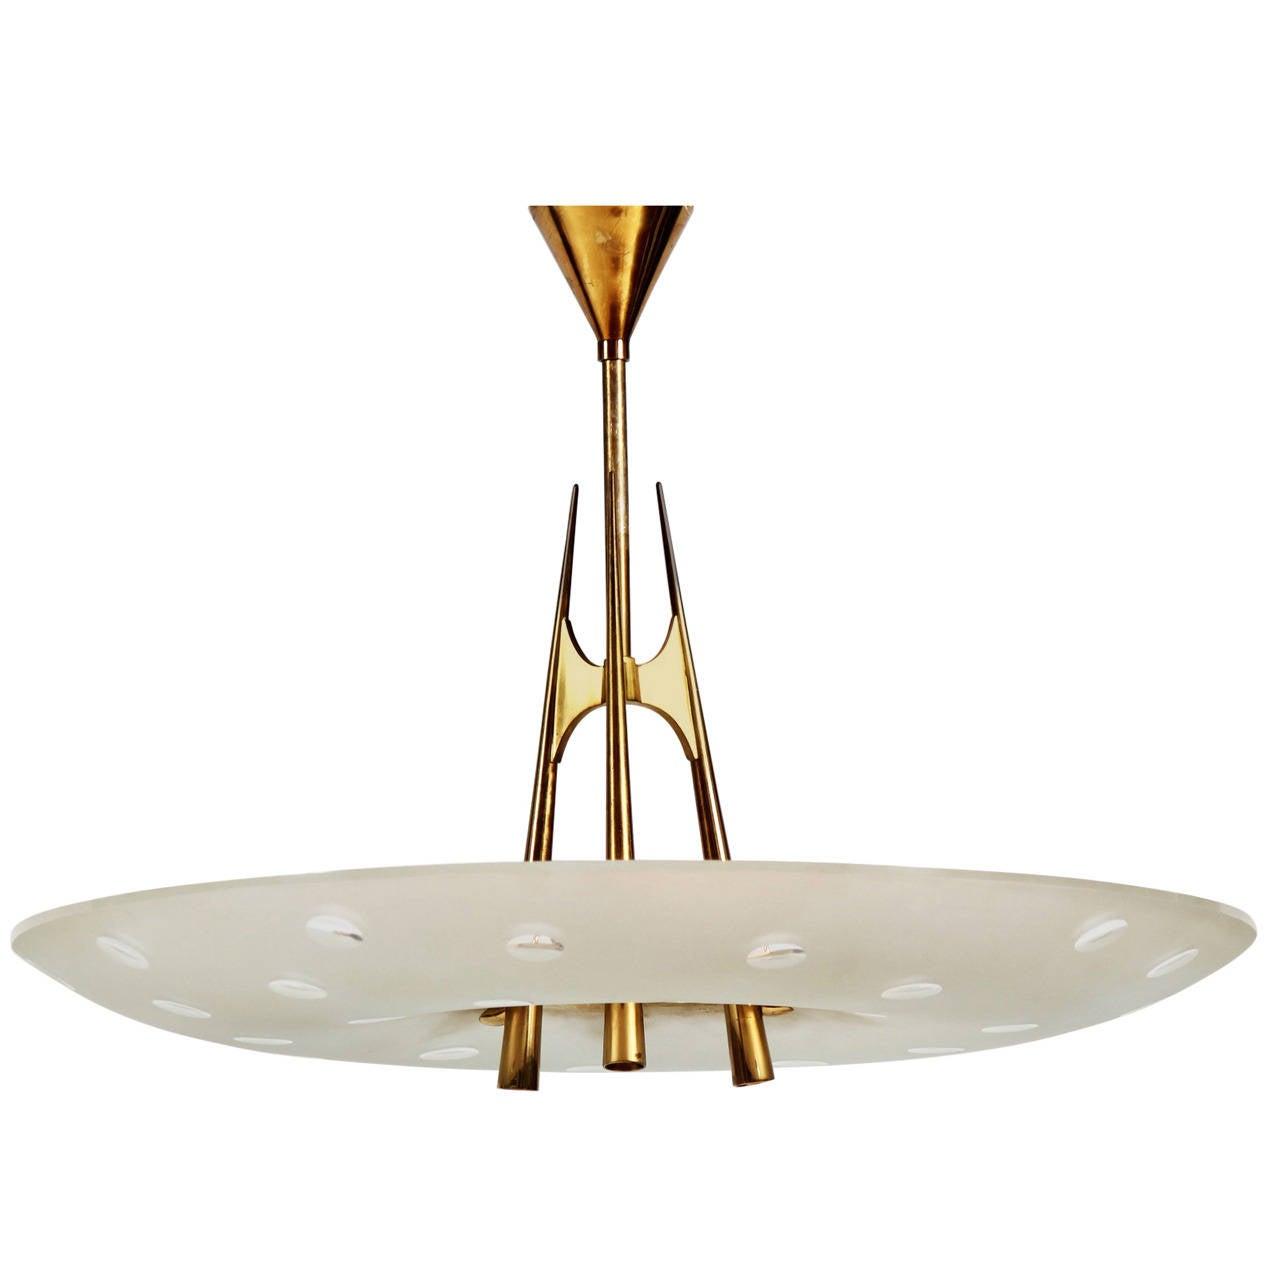 extraordinary chandelier design fontana arte by max. Black Bedroom Furniture Sets. Home Design Ideas